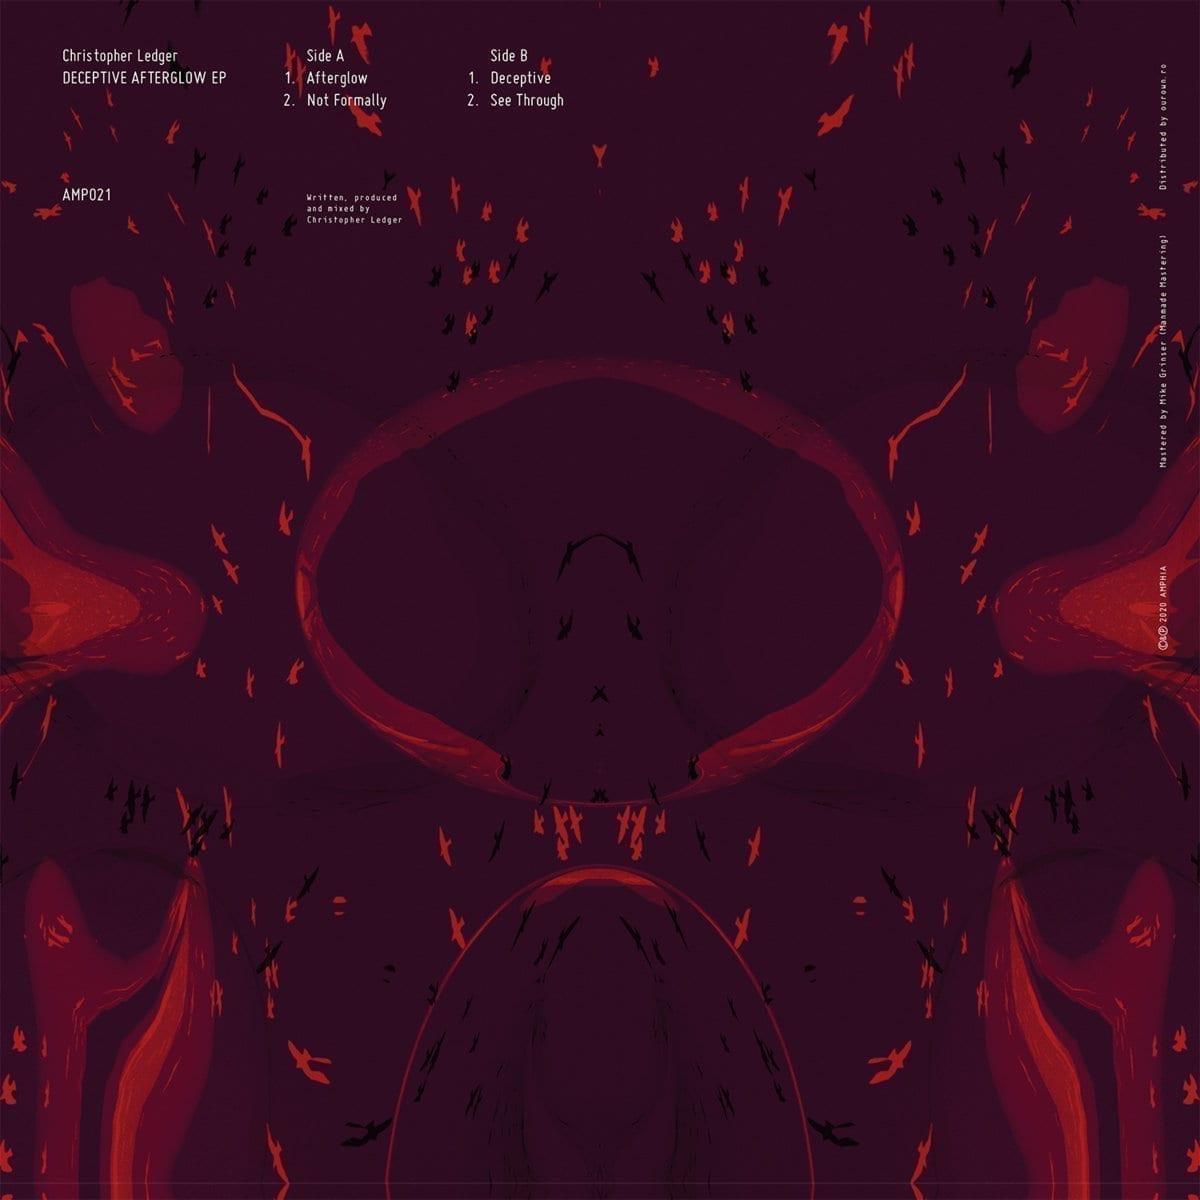 Christopher Ledger - Deceptive Afterglow EP